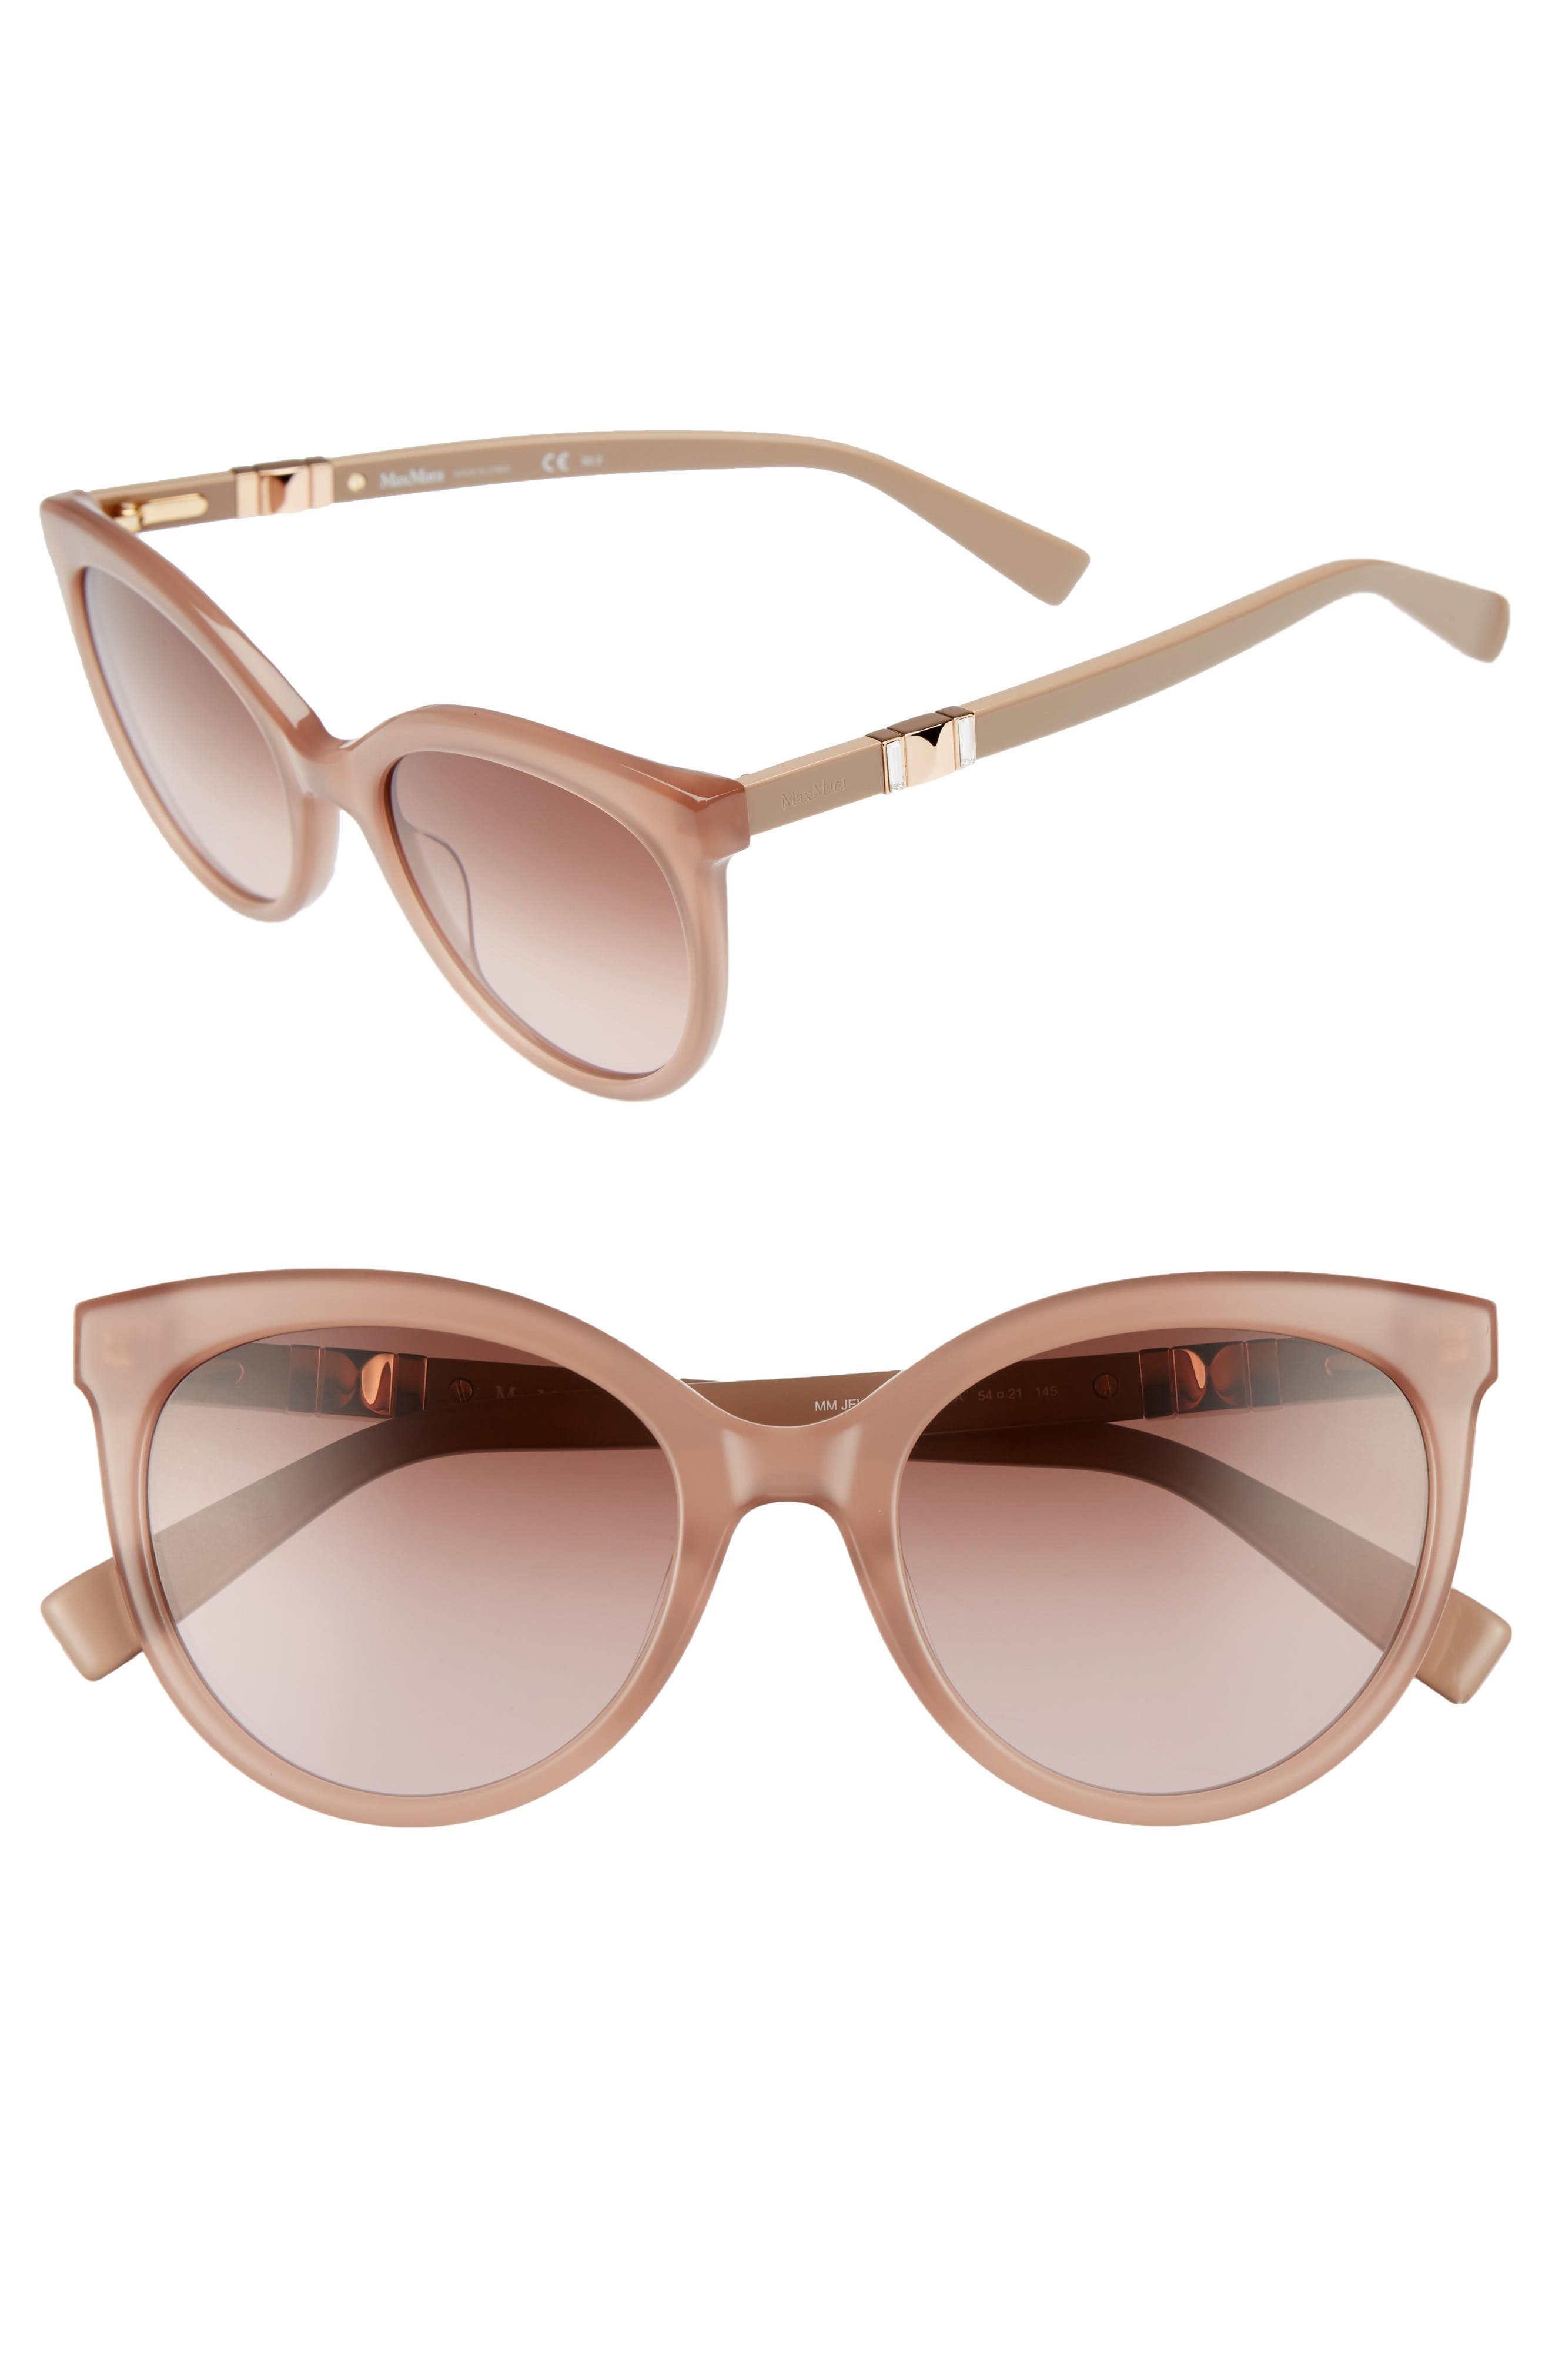 Jeweliis 54mm Gradient Cat Eye Sunglasses,                             Main thumbnail 1, color,                             Nude